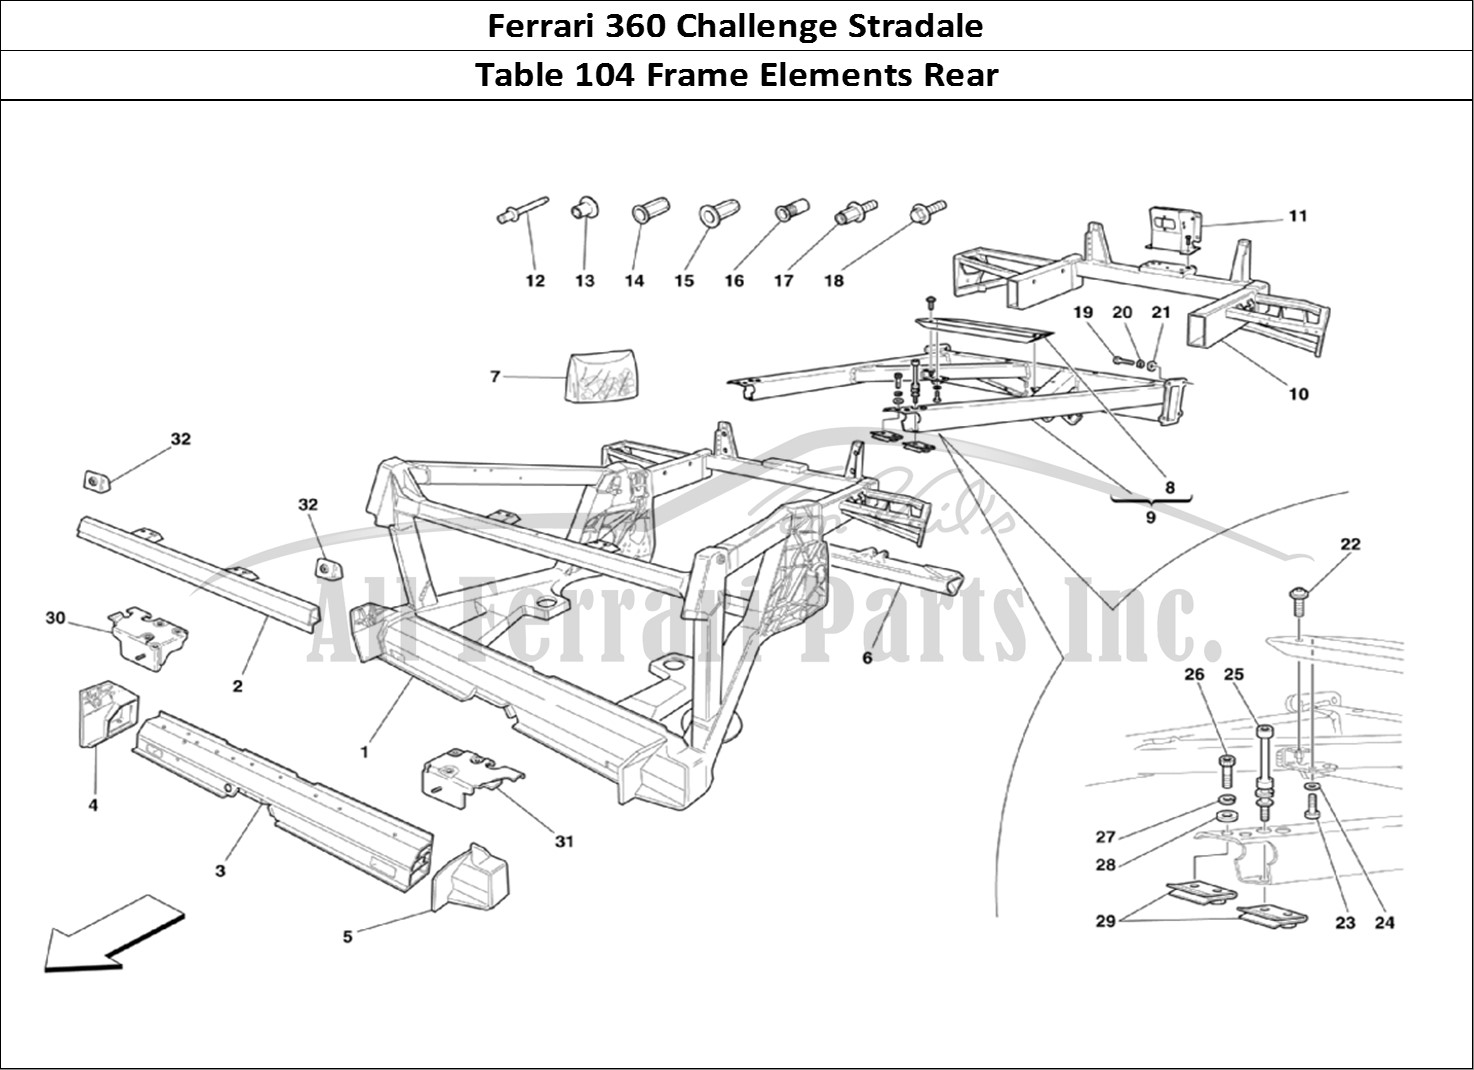 Buy original Ferrari 360 Challenge Stradale 104 Frame